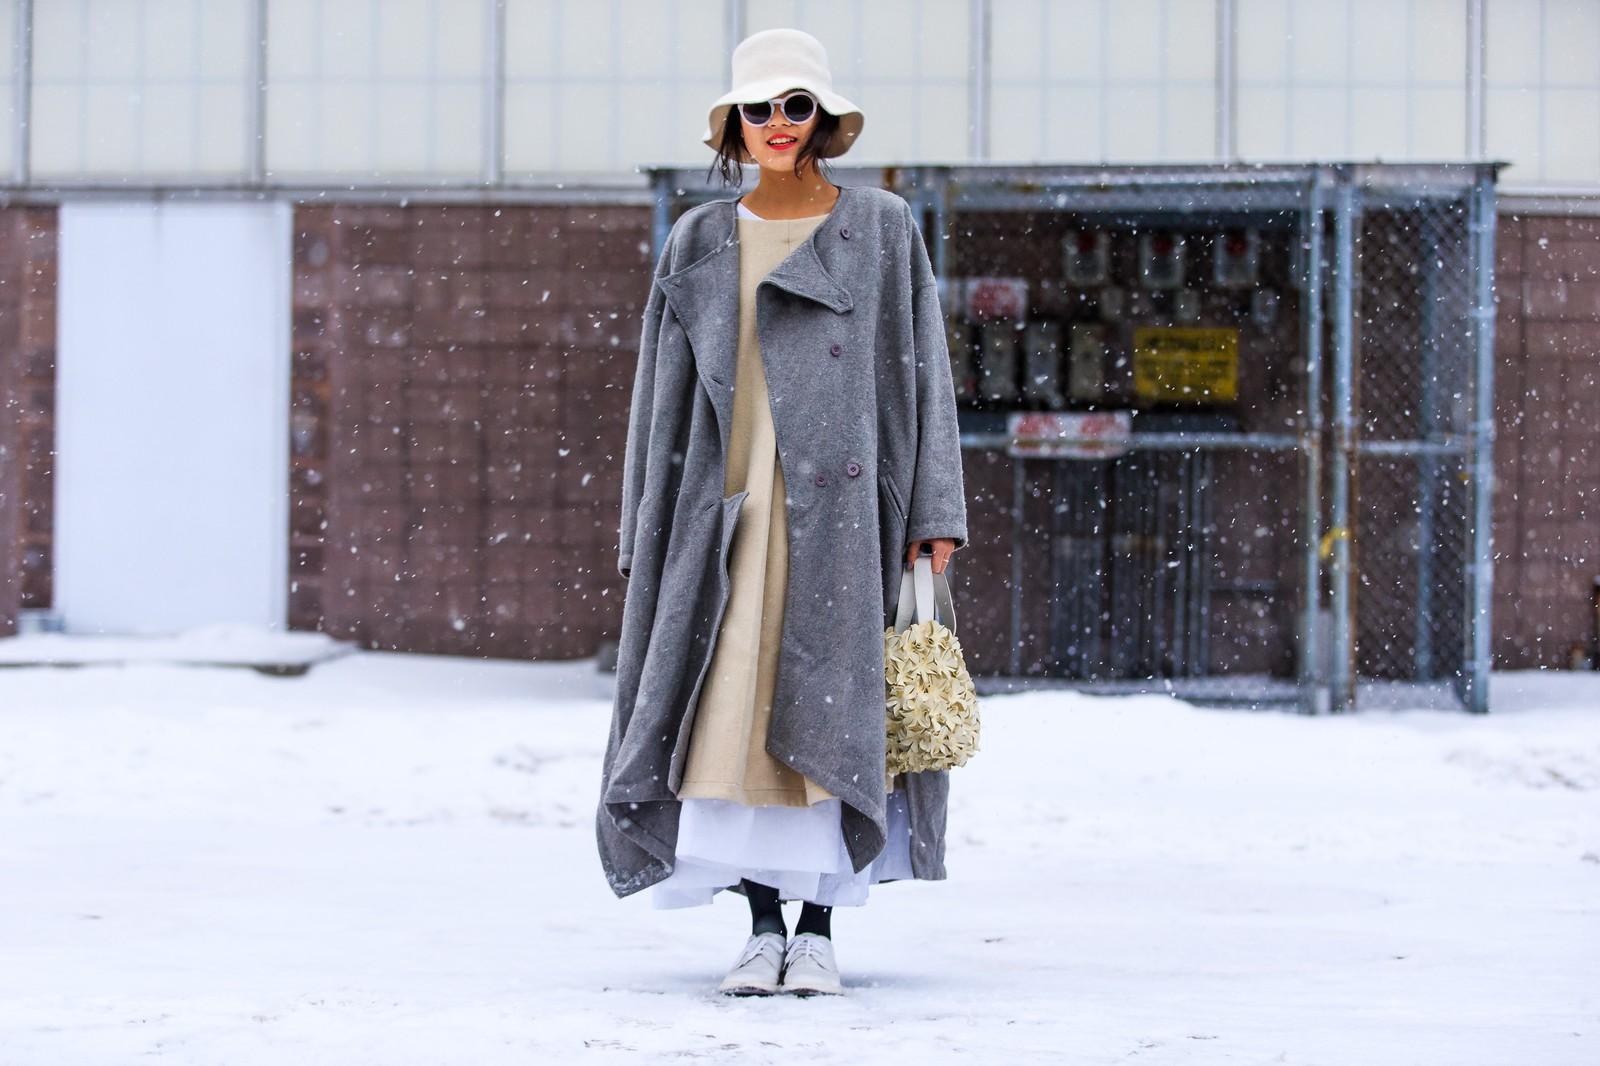 atmosphere details, AUTUMN WINTER 2015-2016, AW 15-16, beige dress, FALL WINTER 2015-2016, fashion week, full length, FW, FW 15-16, grey coat, horizontal, maxi coat, maxi dress, NEW YORK, NYFW, oversize coat, oversize dress, street style, white brogues, white handbag, white hat, white sunglasses, woman, wool coat